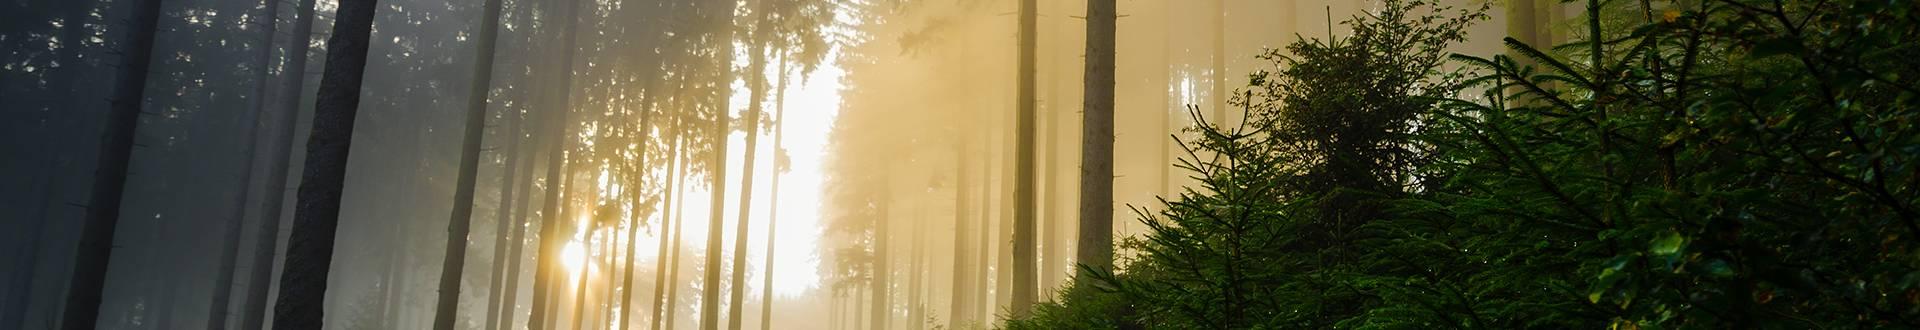 Las podczas wschodu